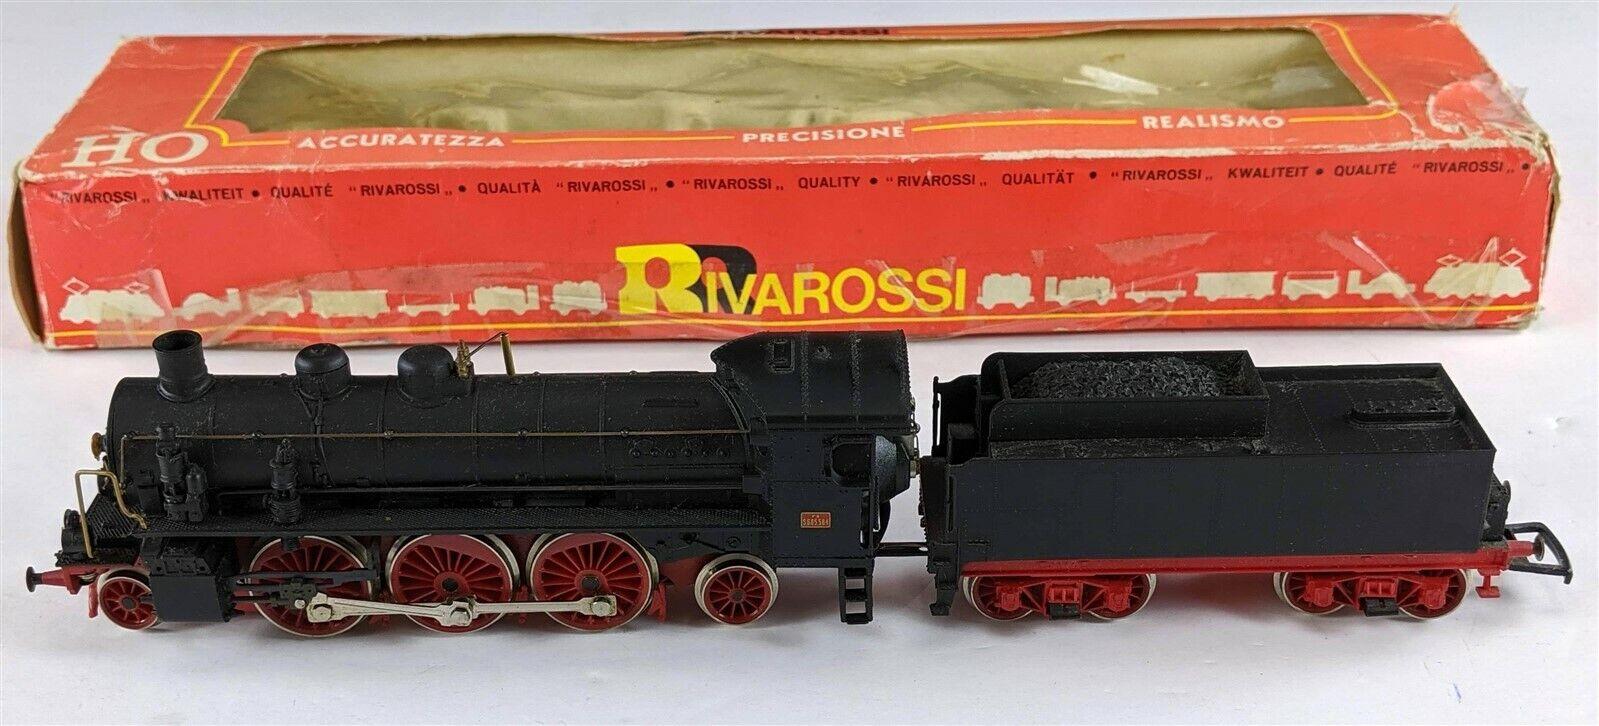 Rivasseau, 1135 gr s 685 584 FS peso bruto de las locomotoras de vapor 2 - 6 - 2 de Italia